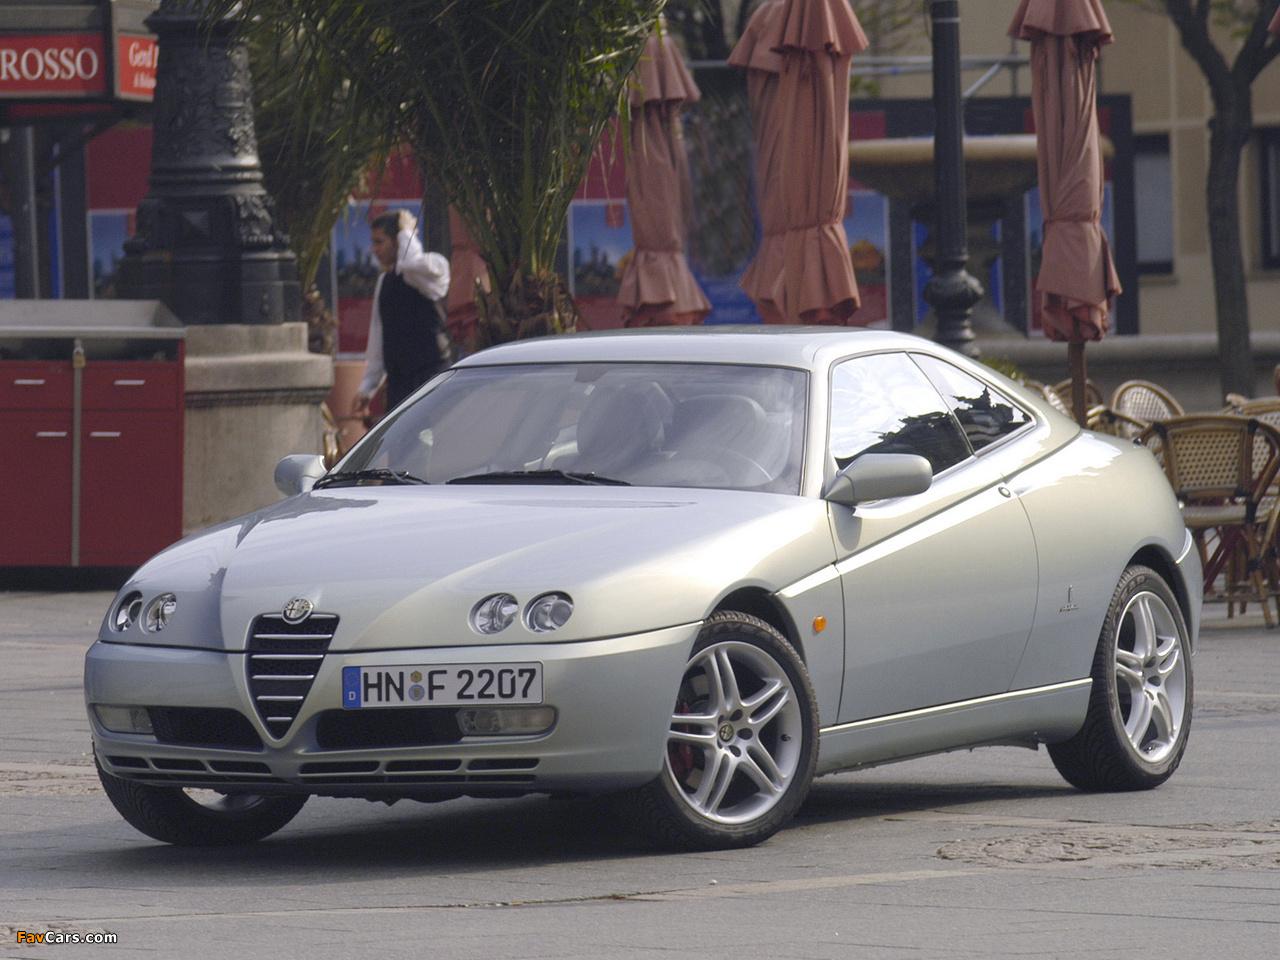 Alfa Romeo Gtv Related Imagesstart 400 Weili Automotive Network 916 Wiring Diagram 20032005 Pictures 1280 X 960